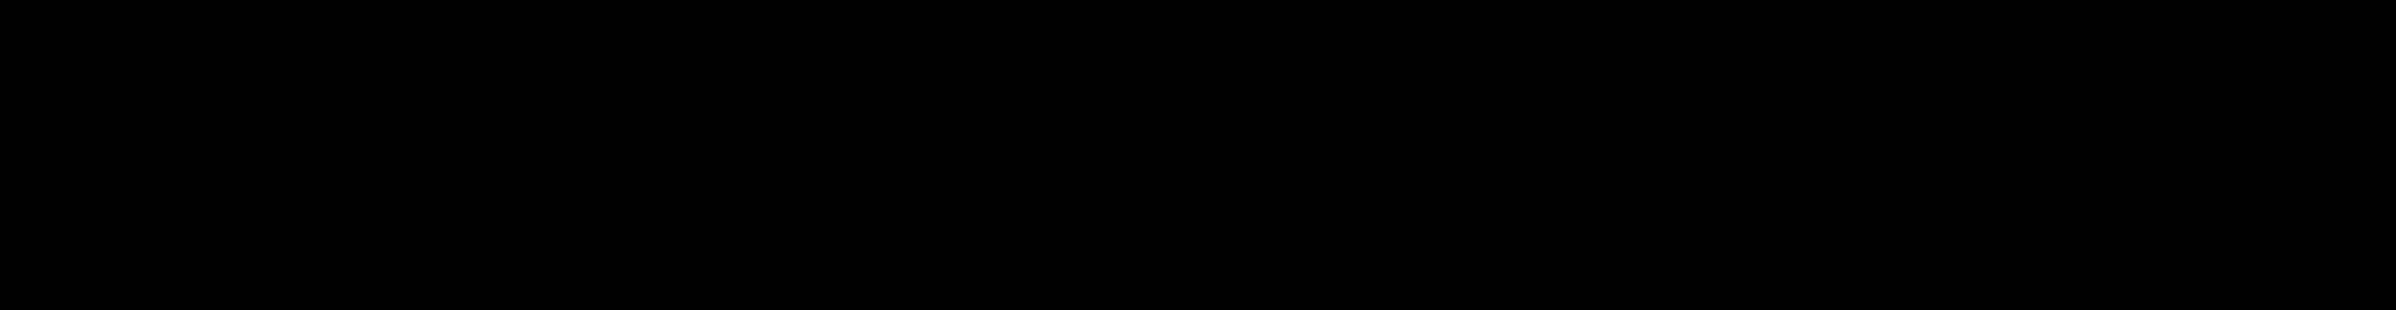 Image-Shr-leo-1